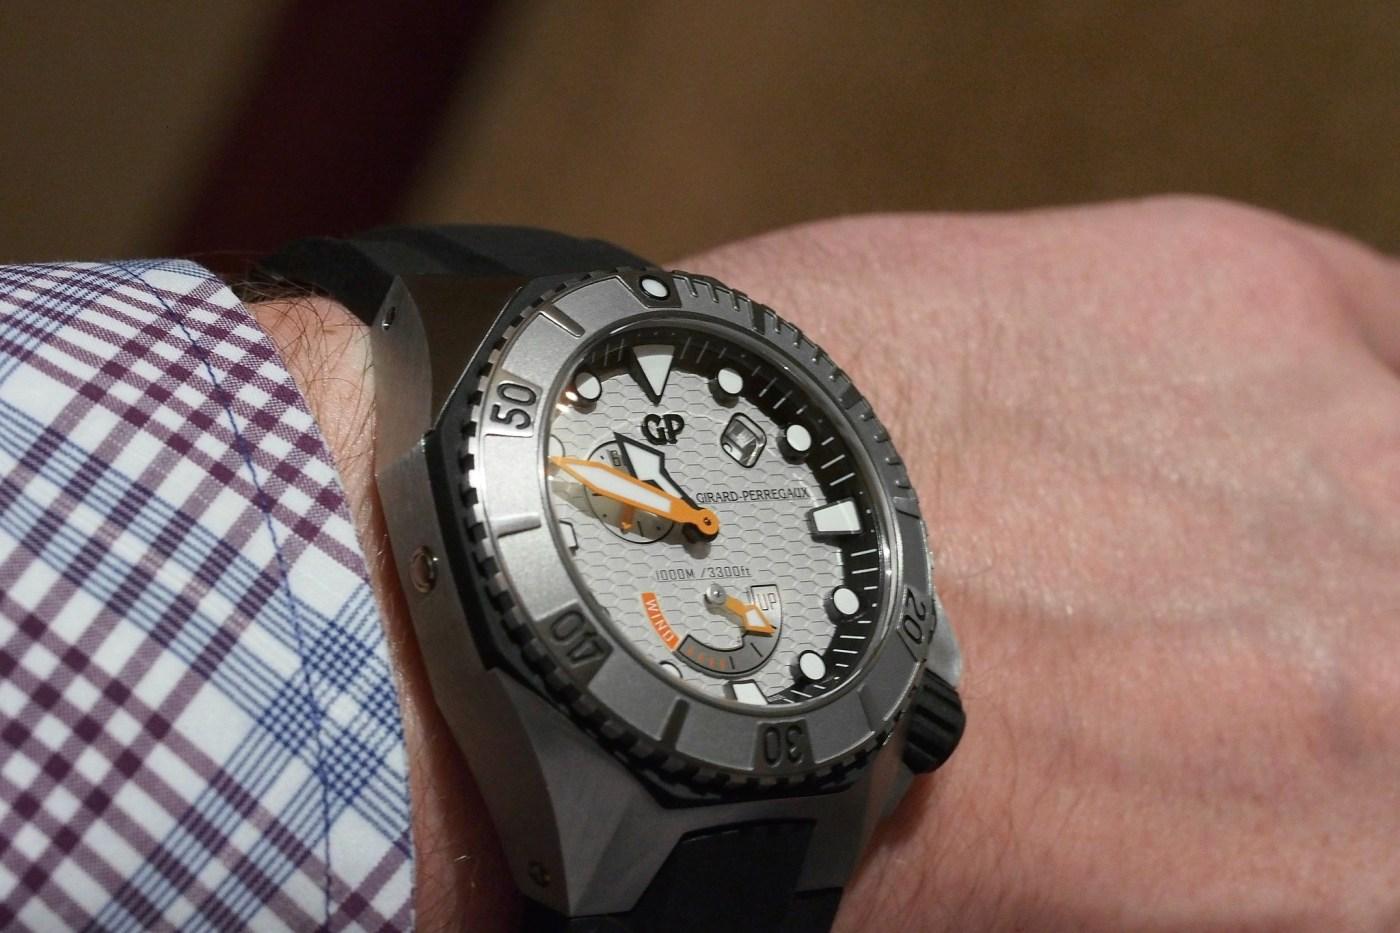 Girard-Perregaux Sea Hawk wristshot